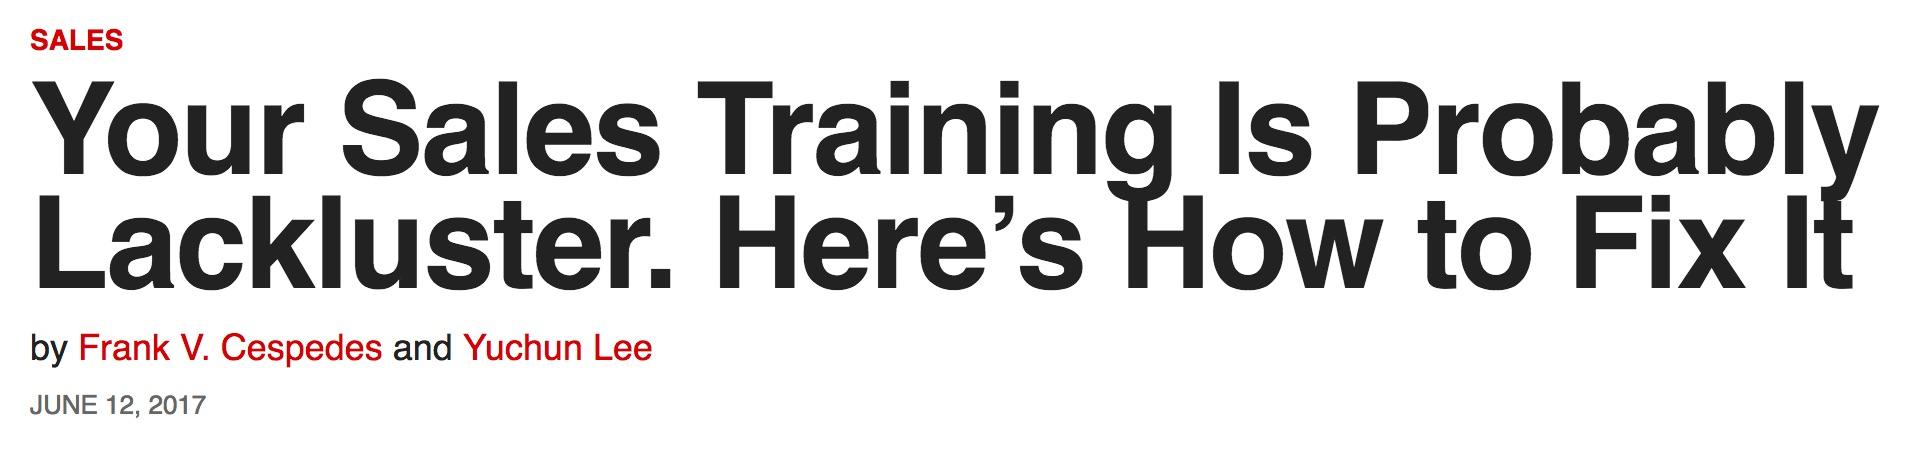 HBR headline